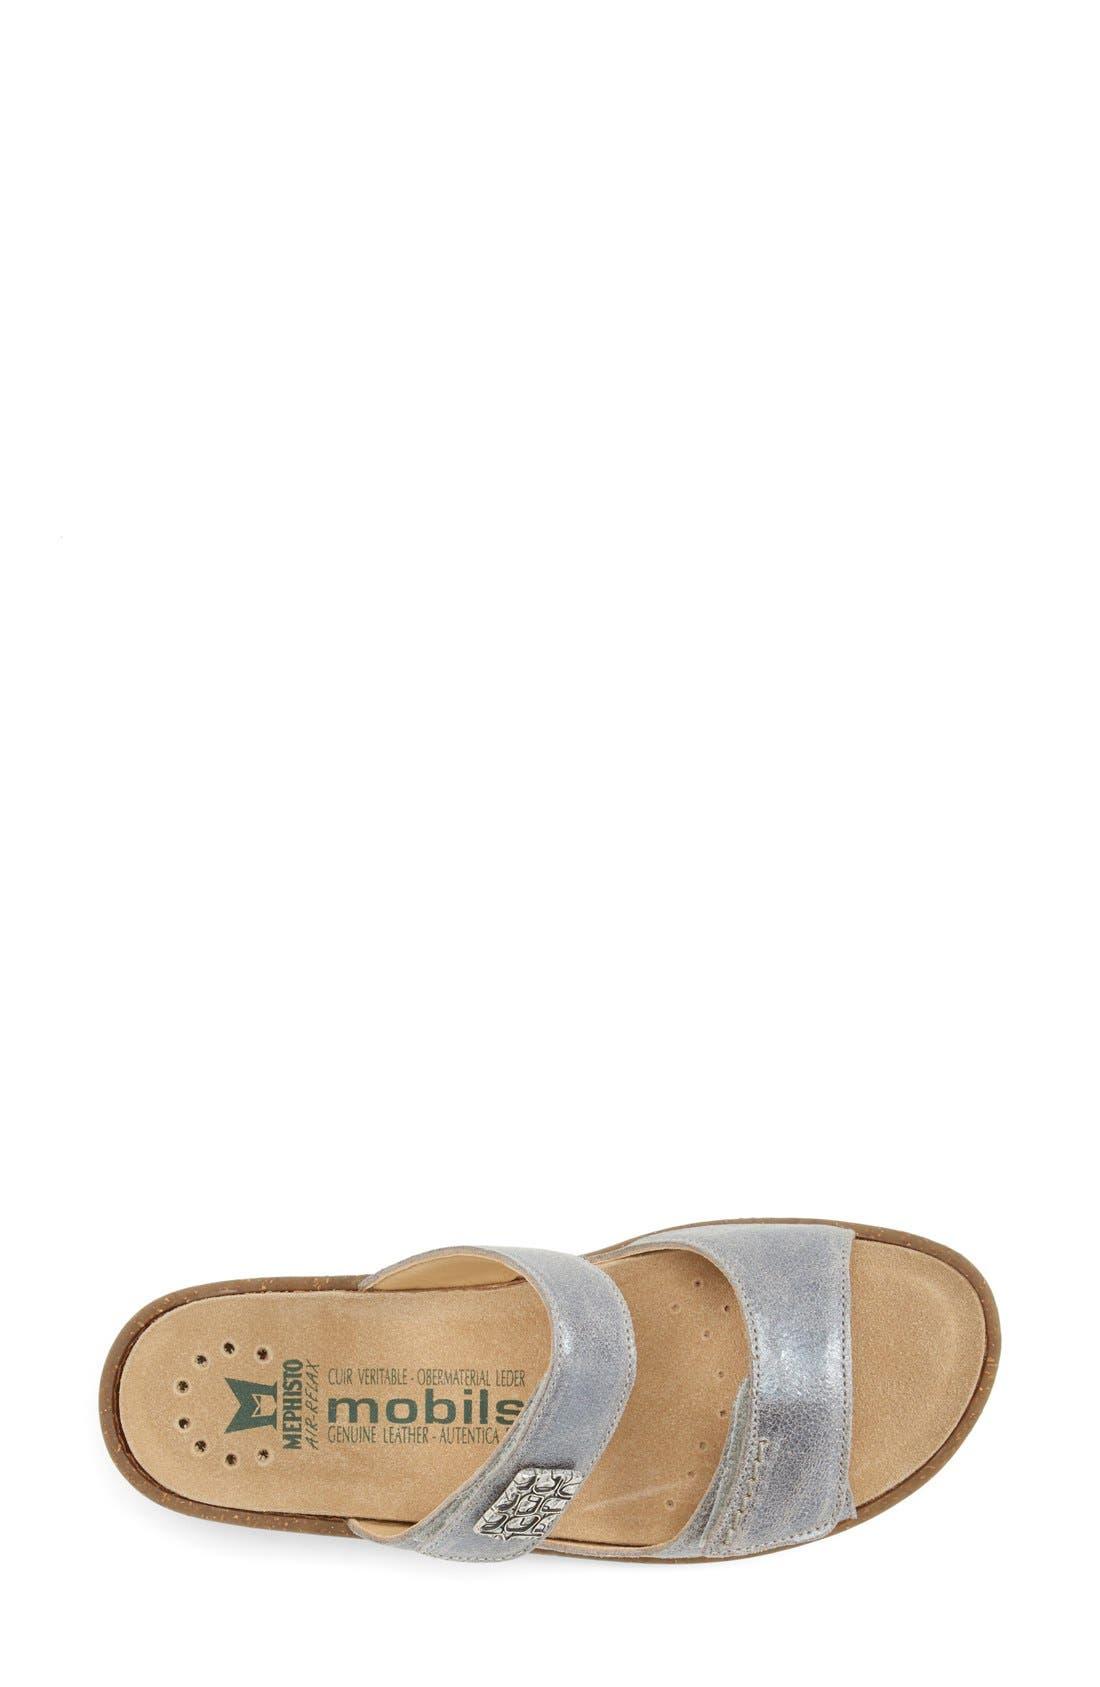 Alternate Image 3  - Mephisto 'Bregalia' Metallic Leather Sandal (Women)